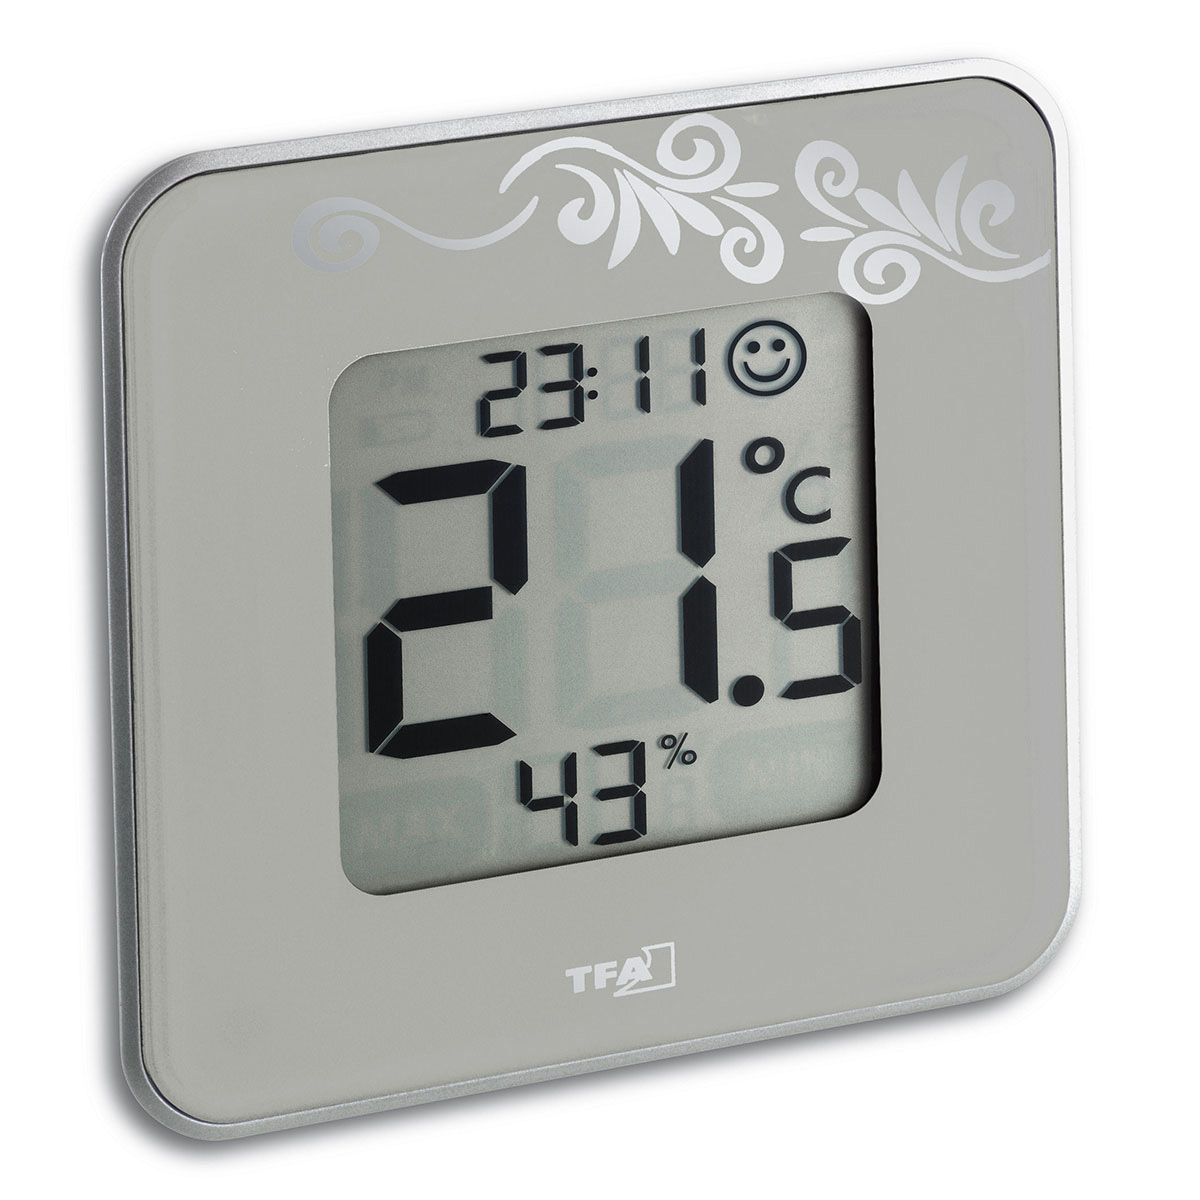 30-5021-02-digitales-thermo-hygrometer-style-ansicht-1200x1200px.jpg